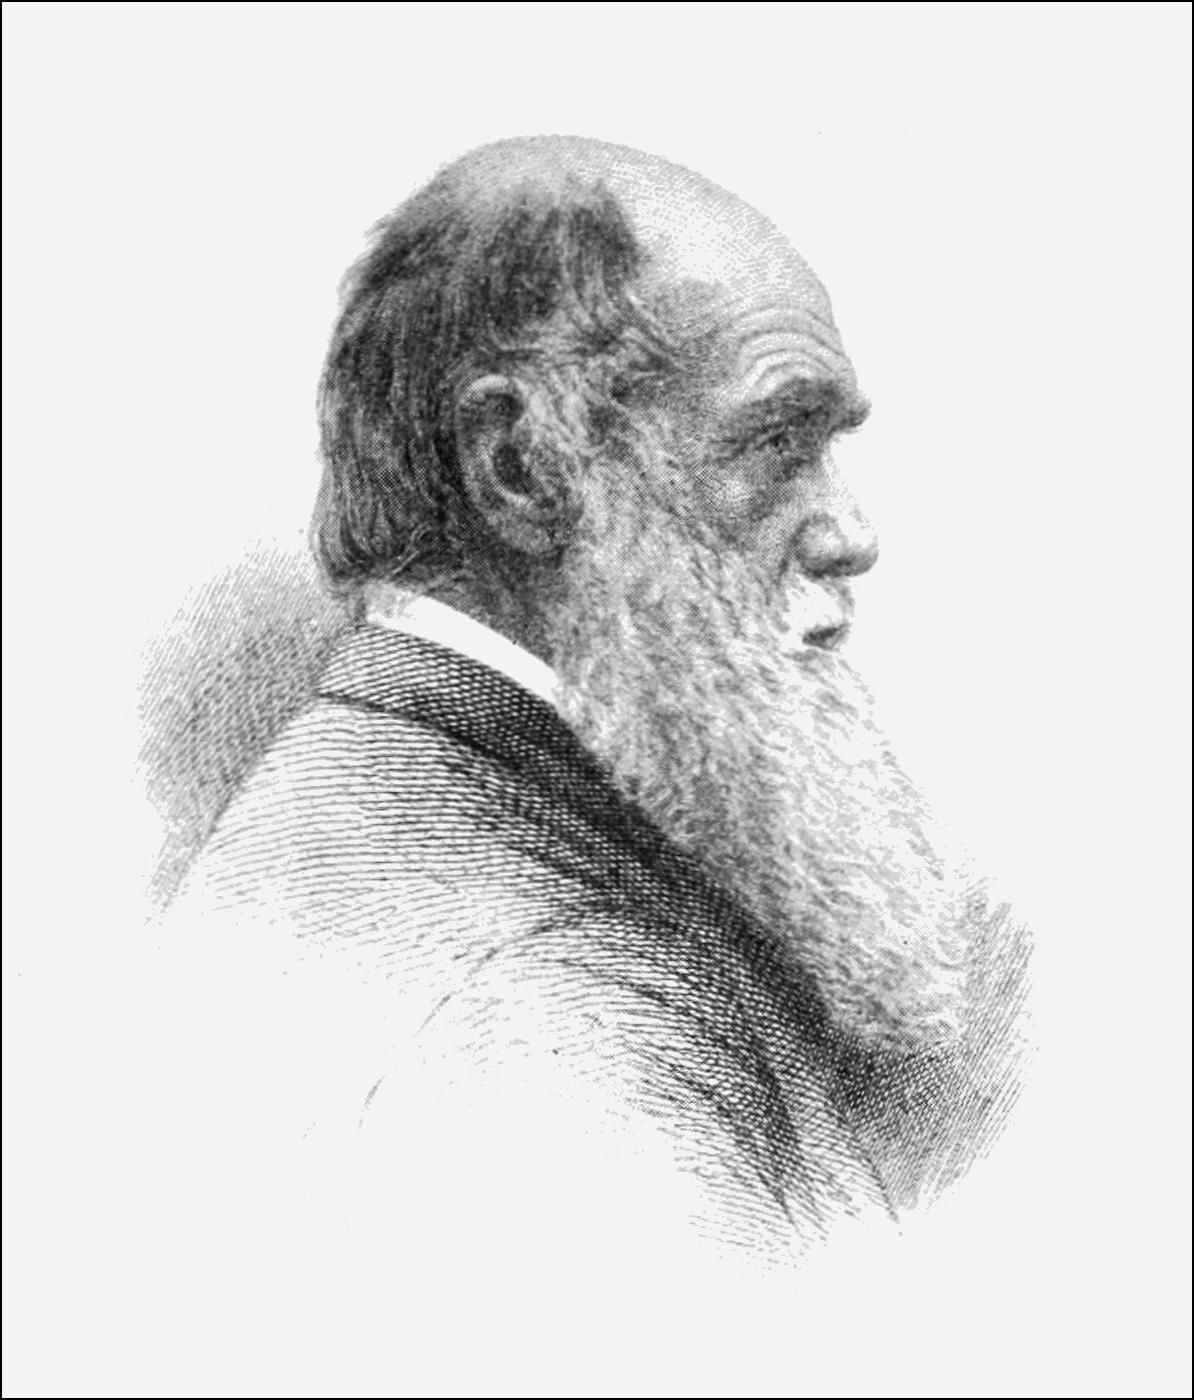 File:PSM V74 D330 Charles Darwin.png.